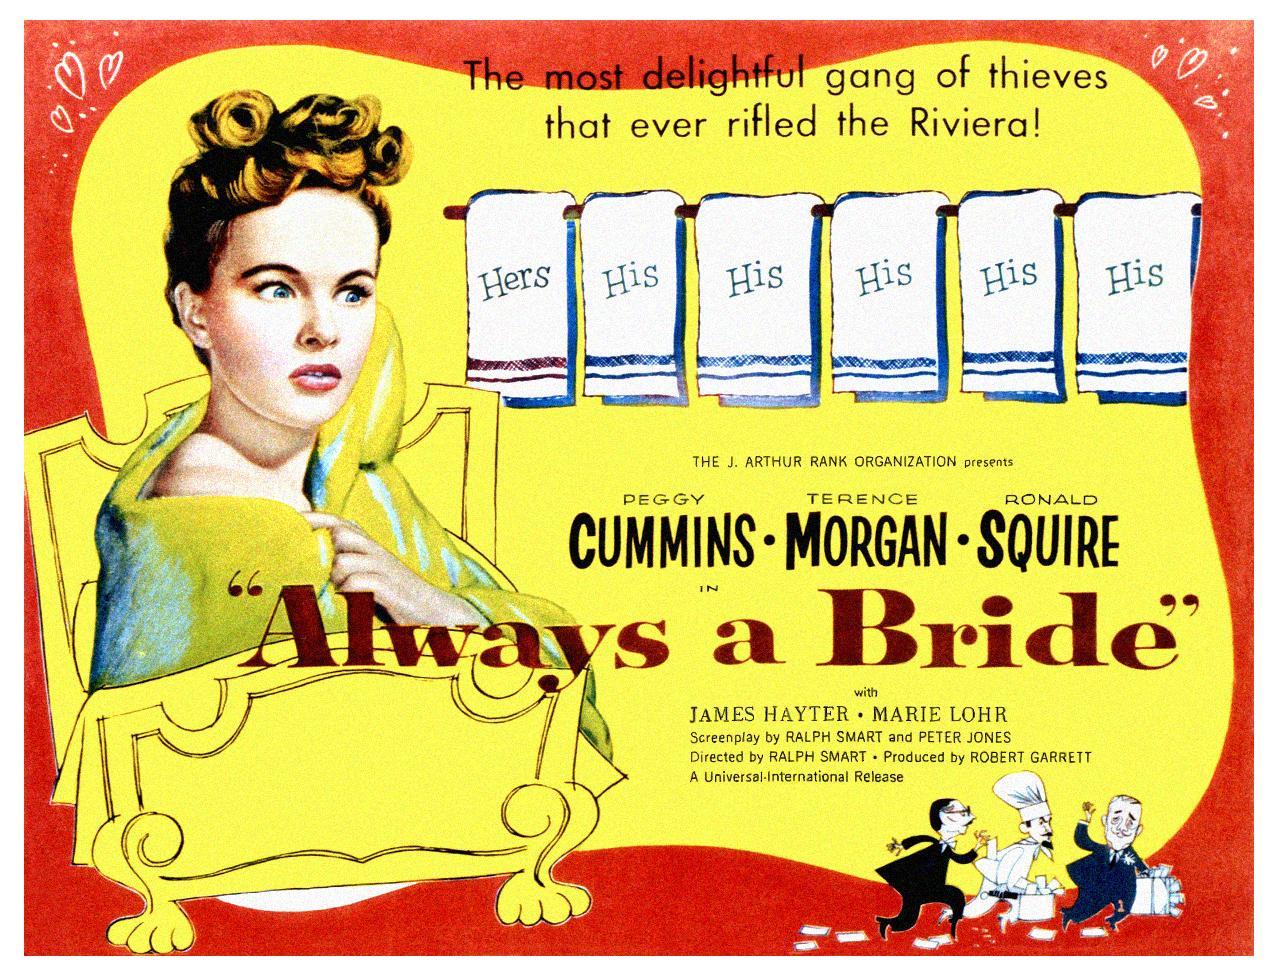 Peggy Cummins in Always a Bride (1953)